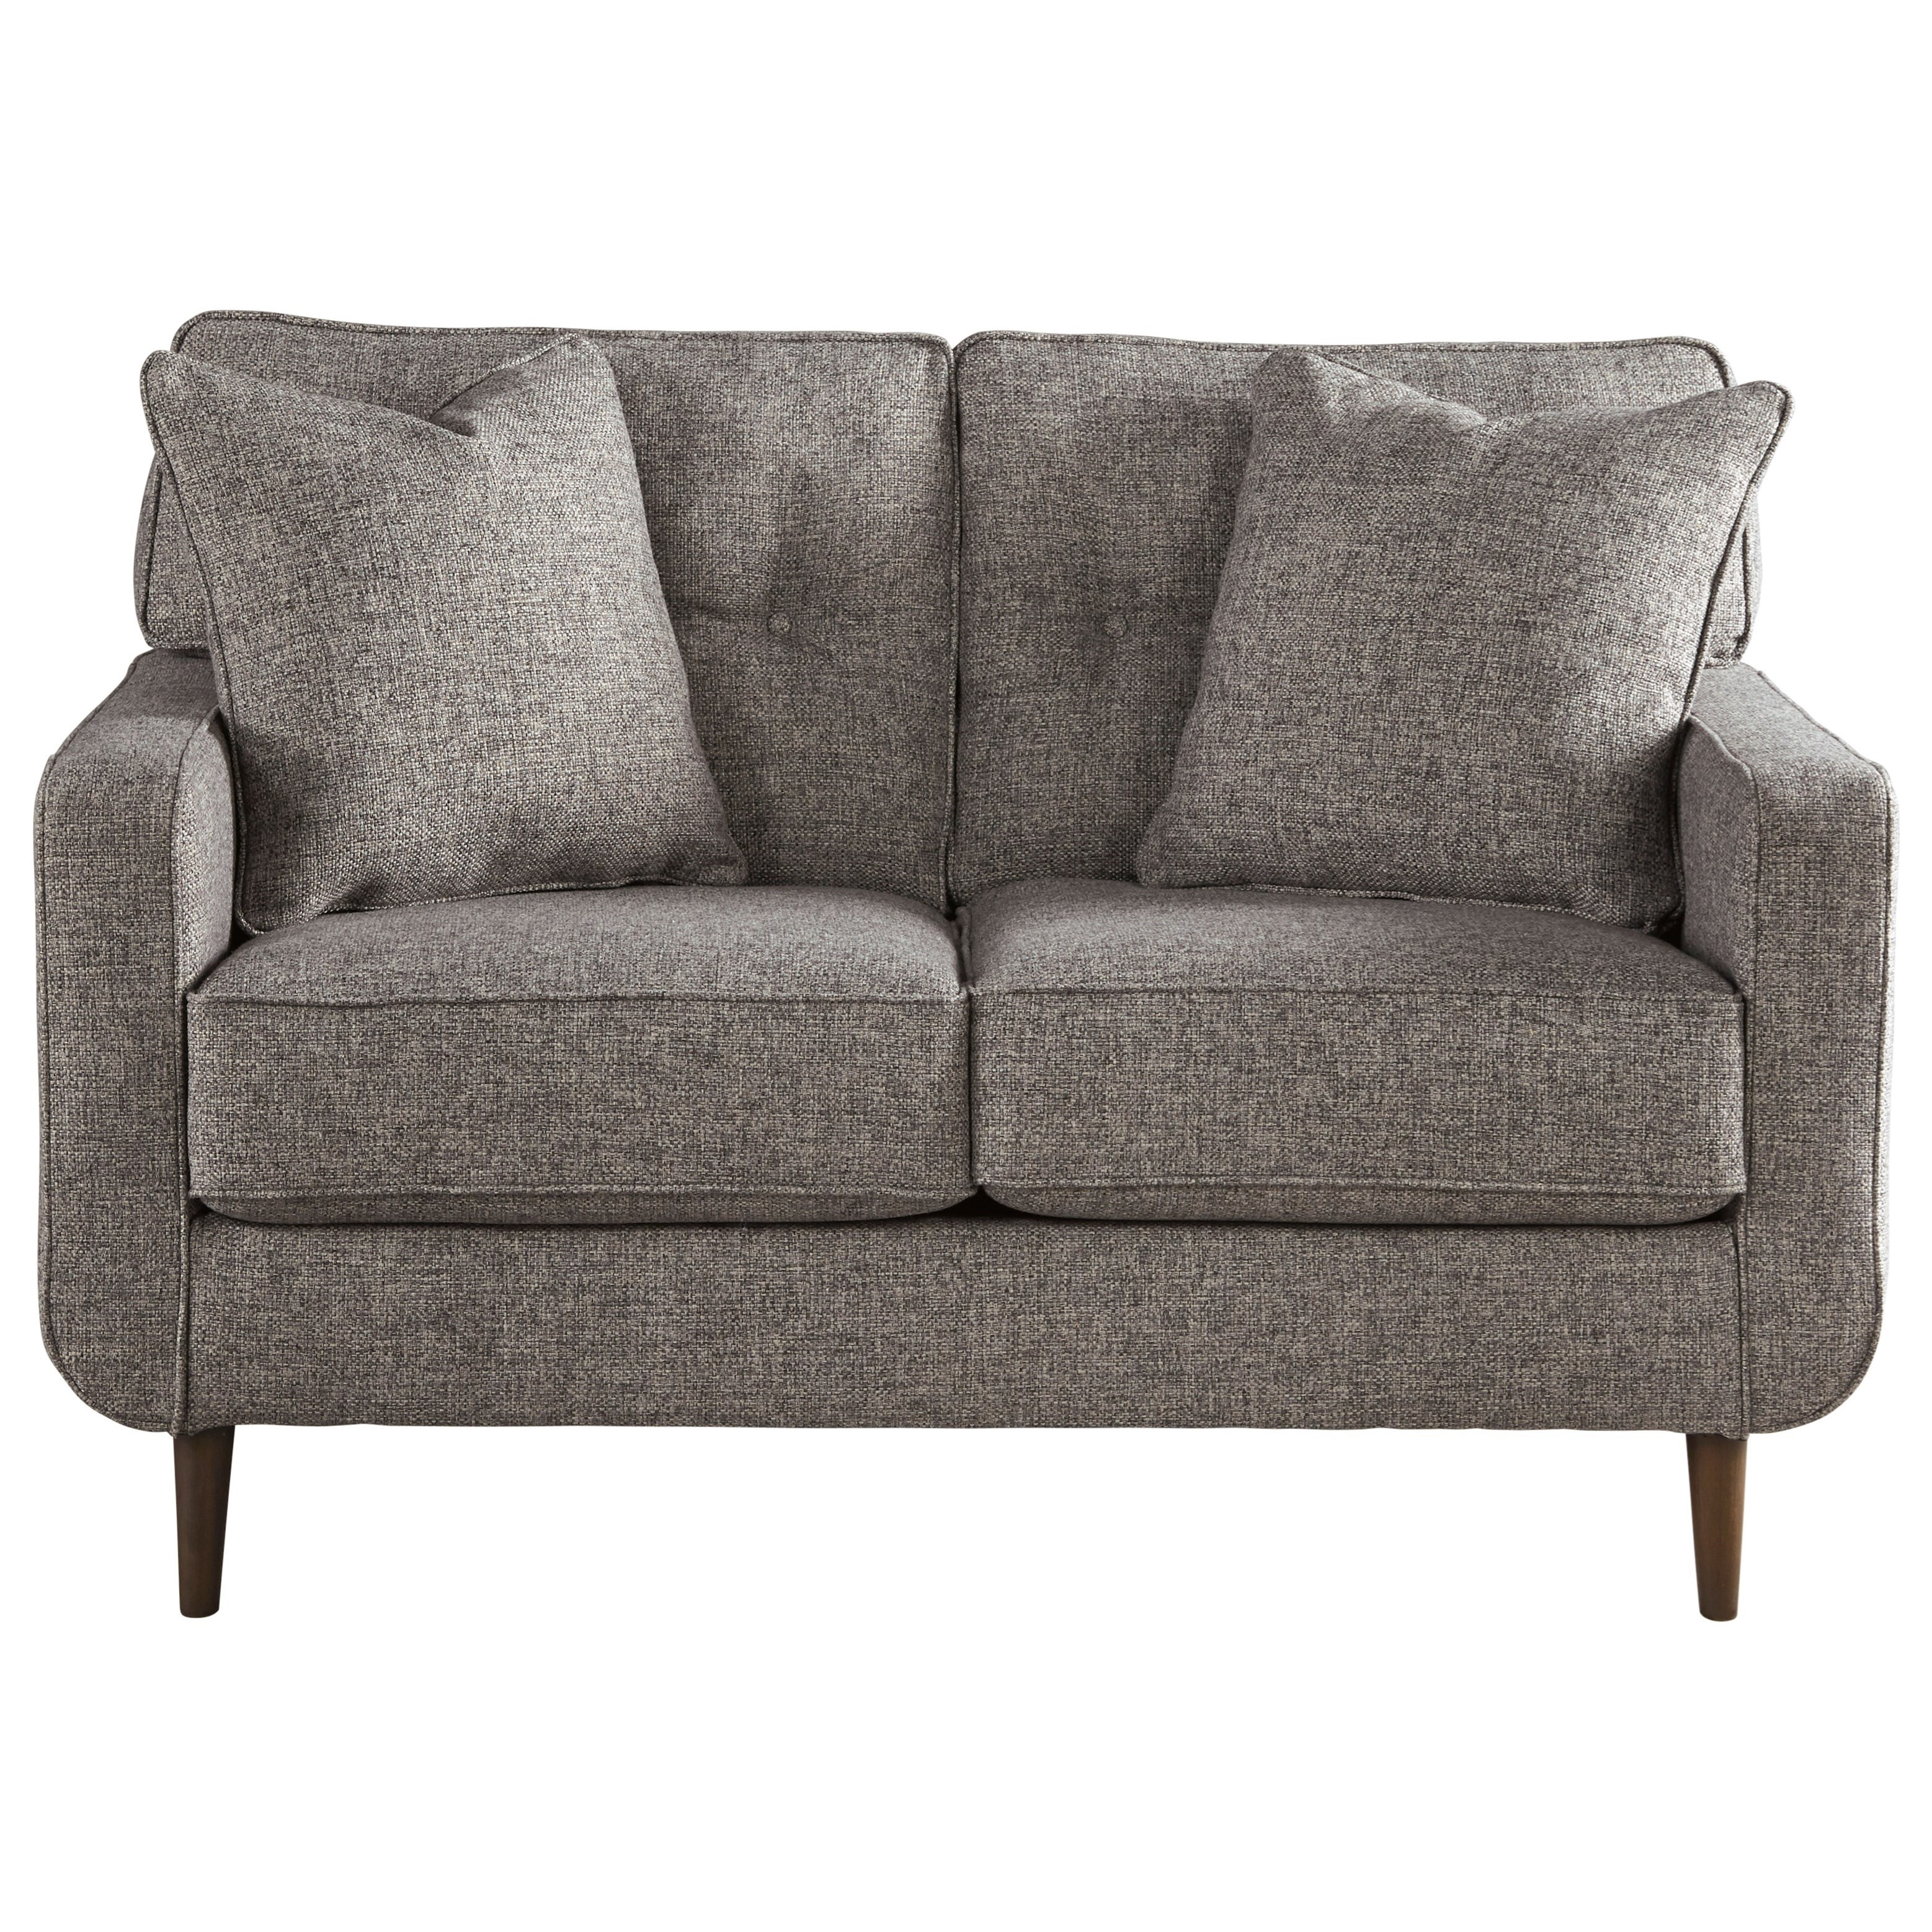 Ashley Furniture Zardoni Loveseat - Item Number: 1140235